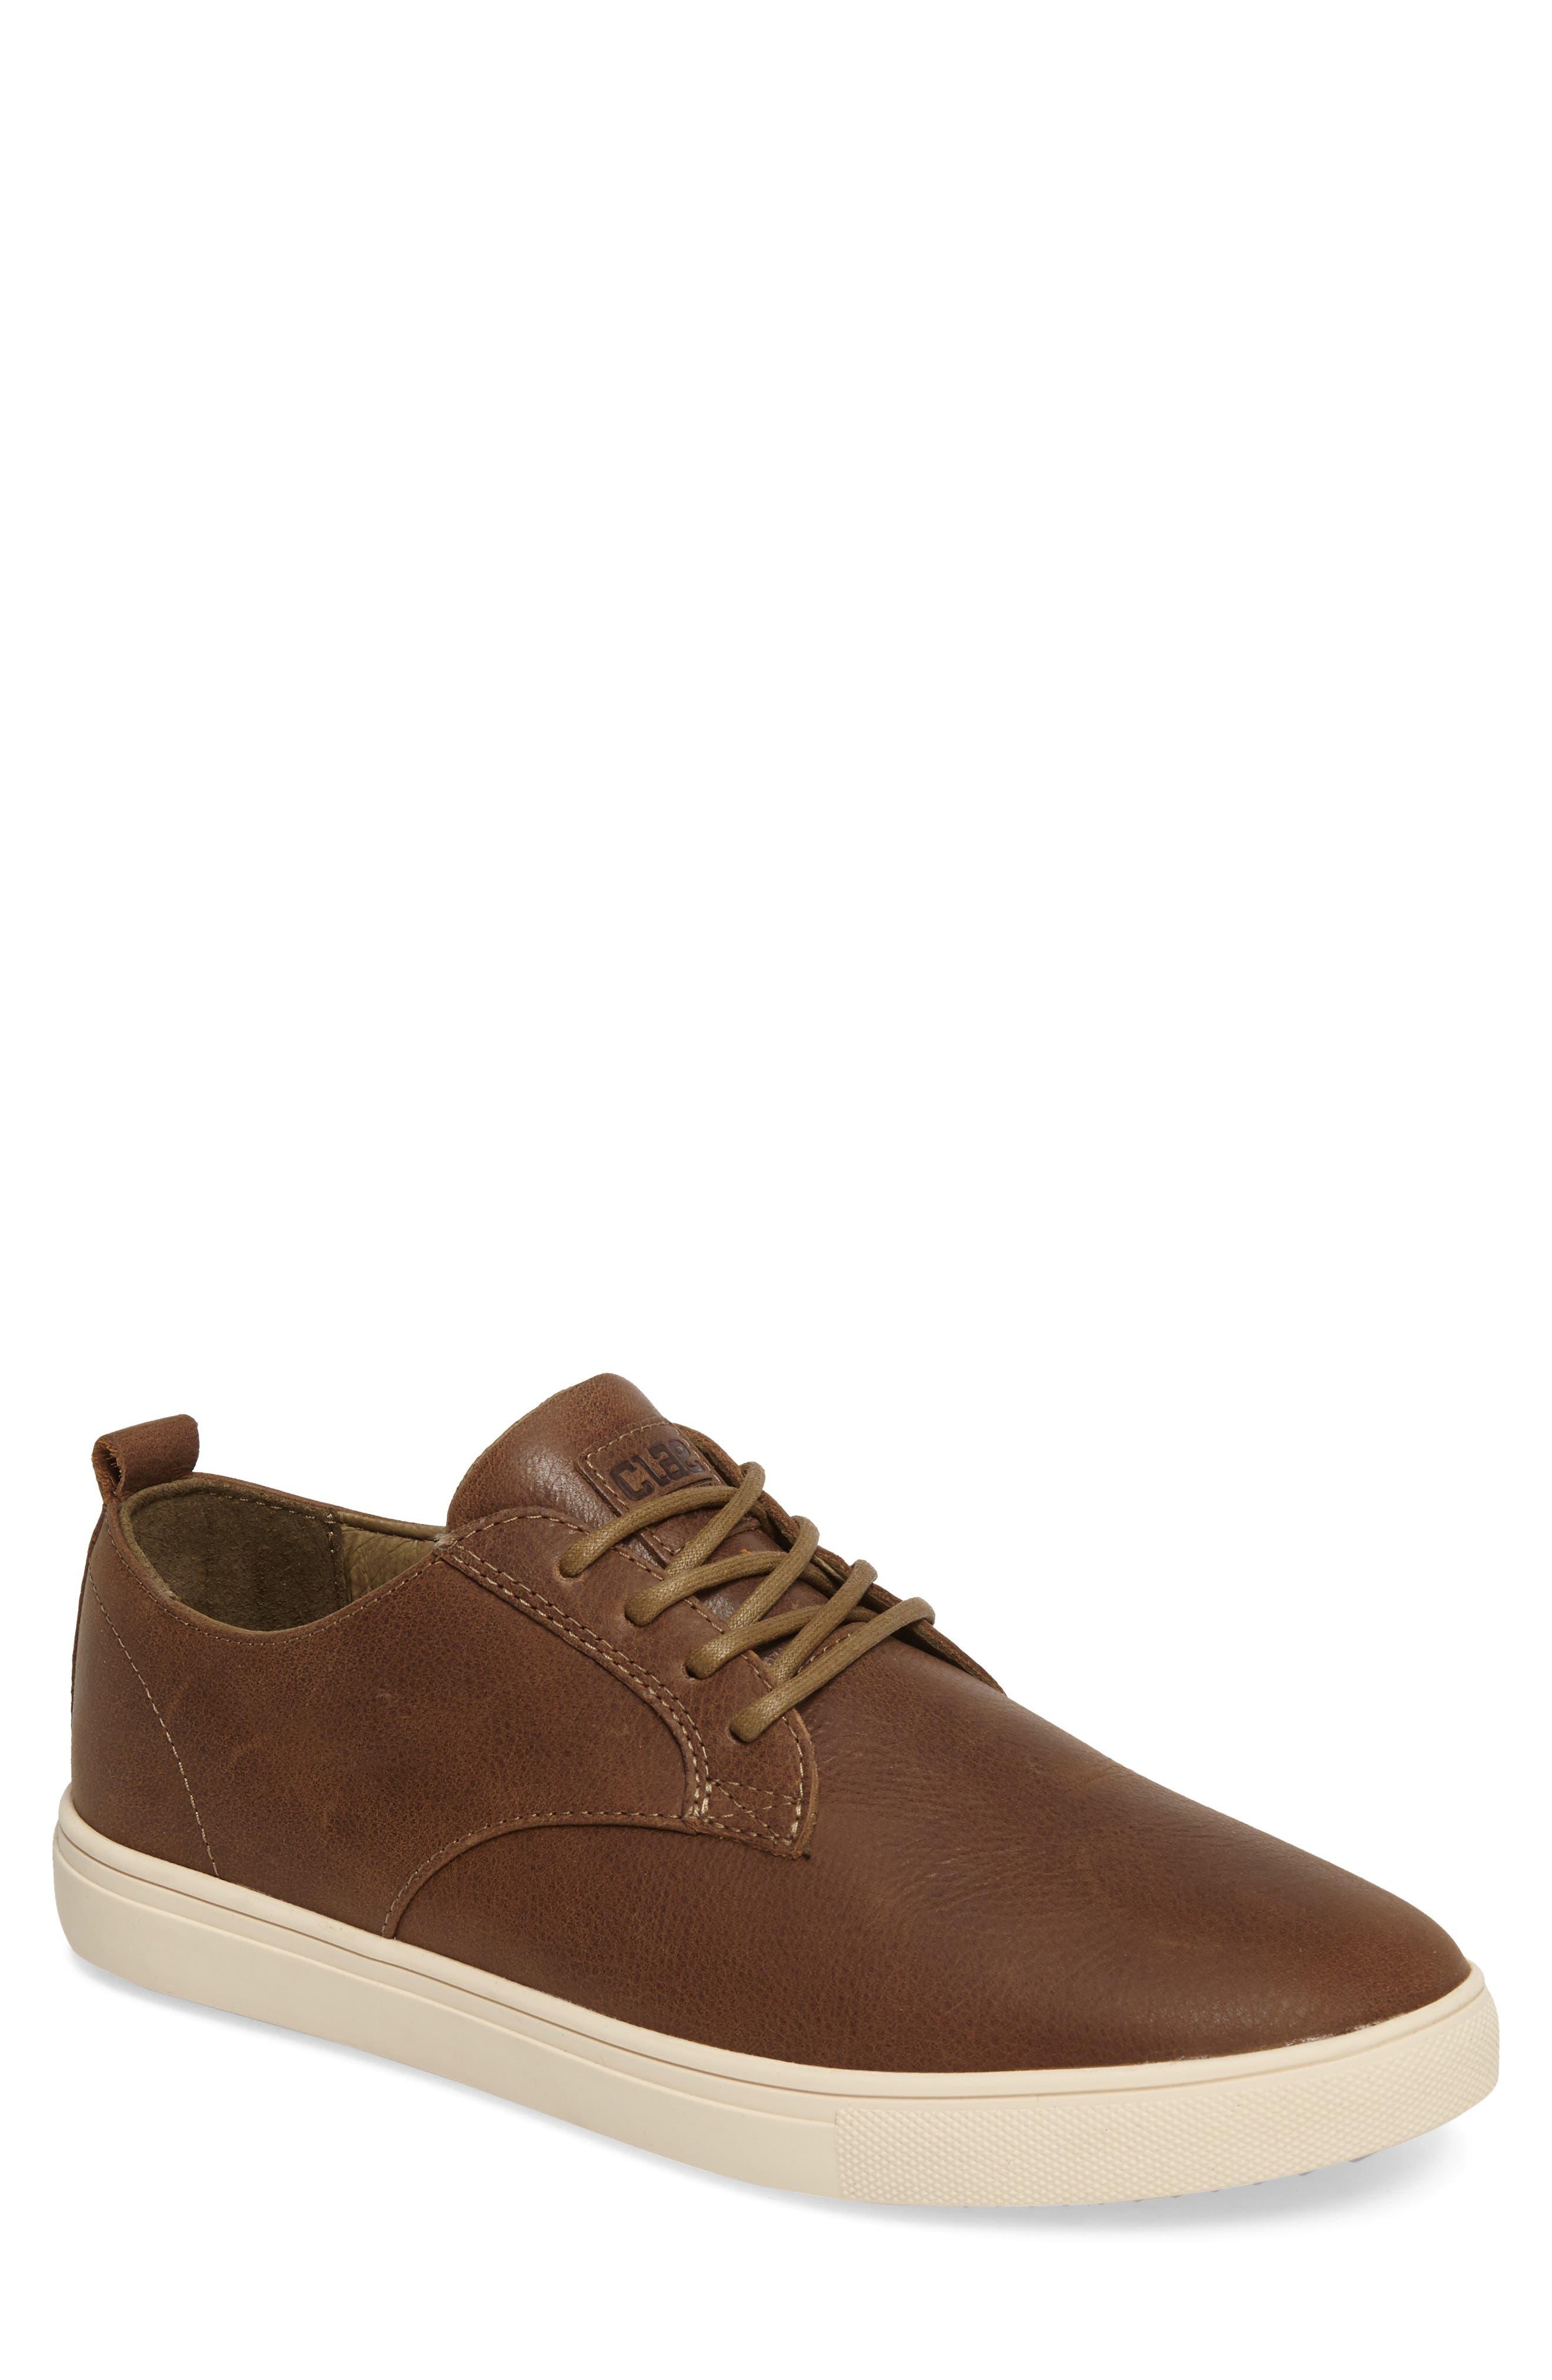 Main Image - Clae 'Ellington' Sneaker (Men)